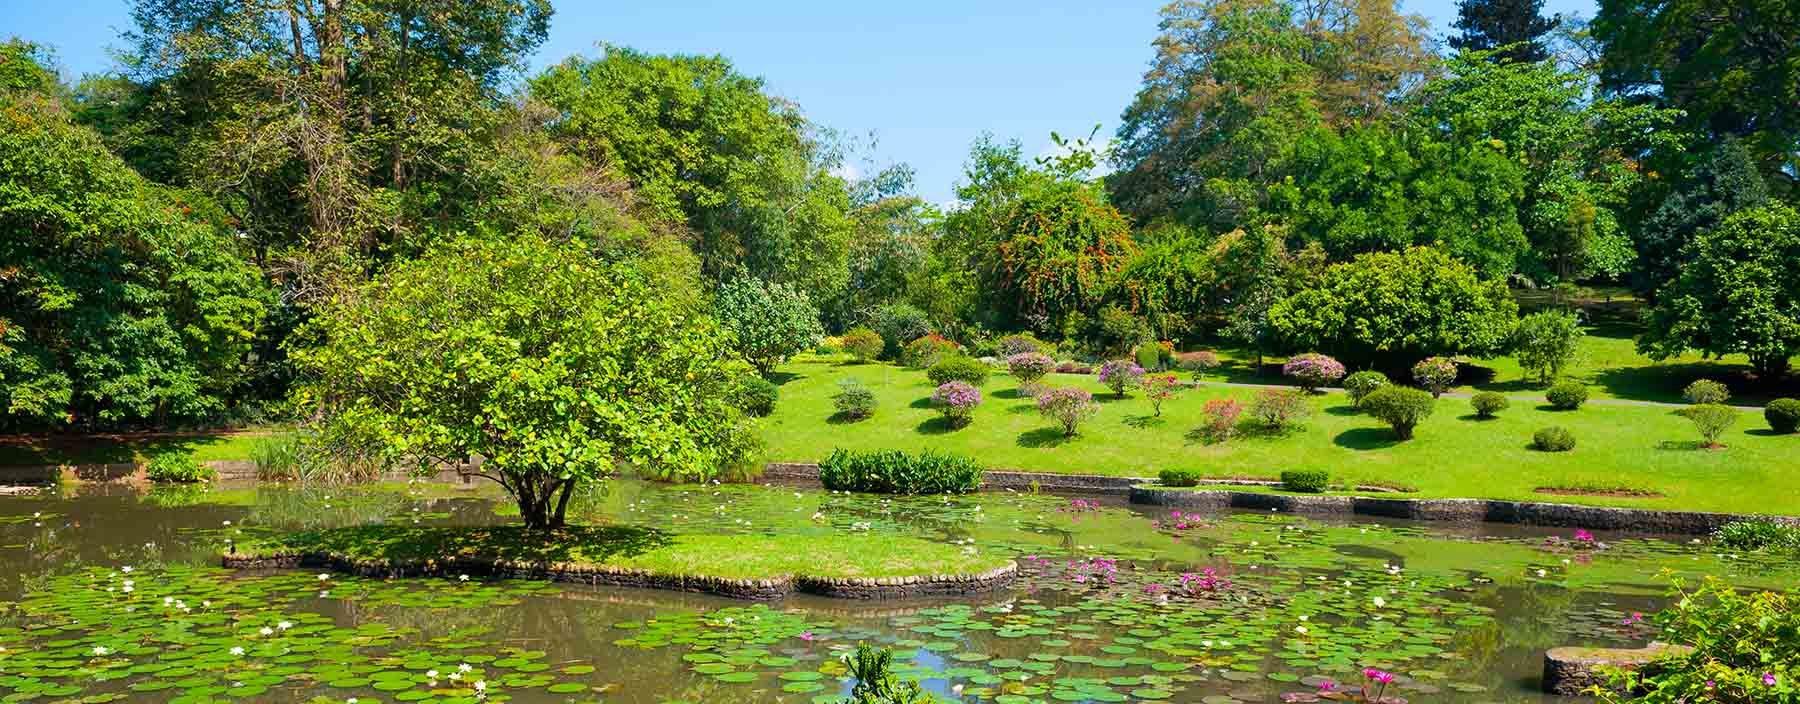 sri lanka, kandy, botanische tuinen (2).jpg